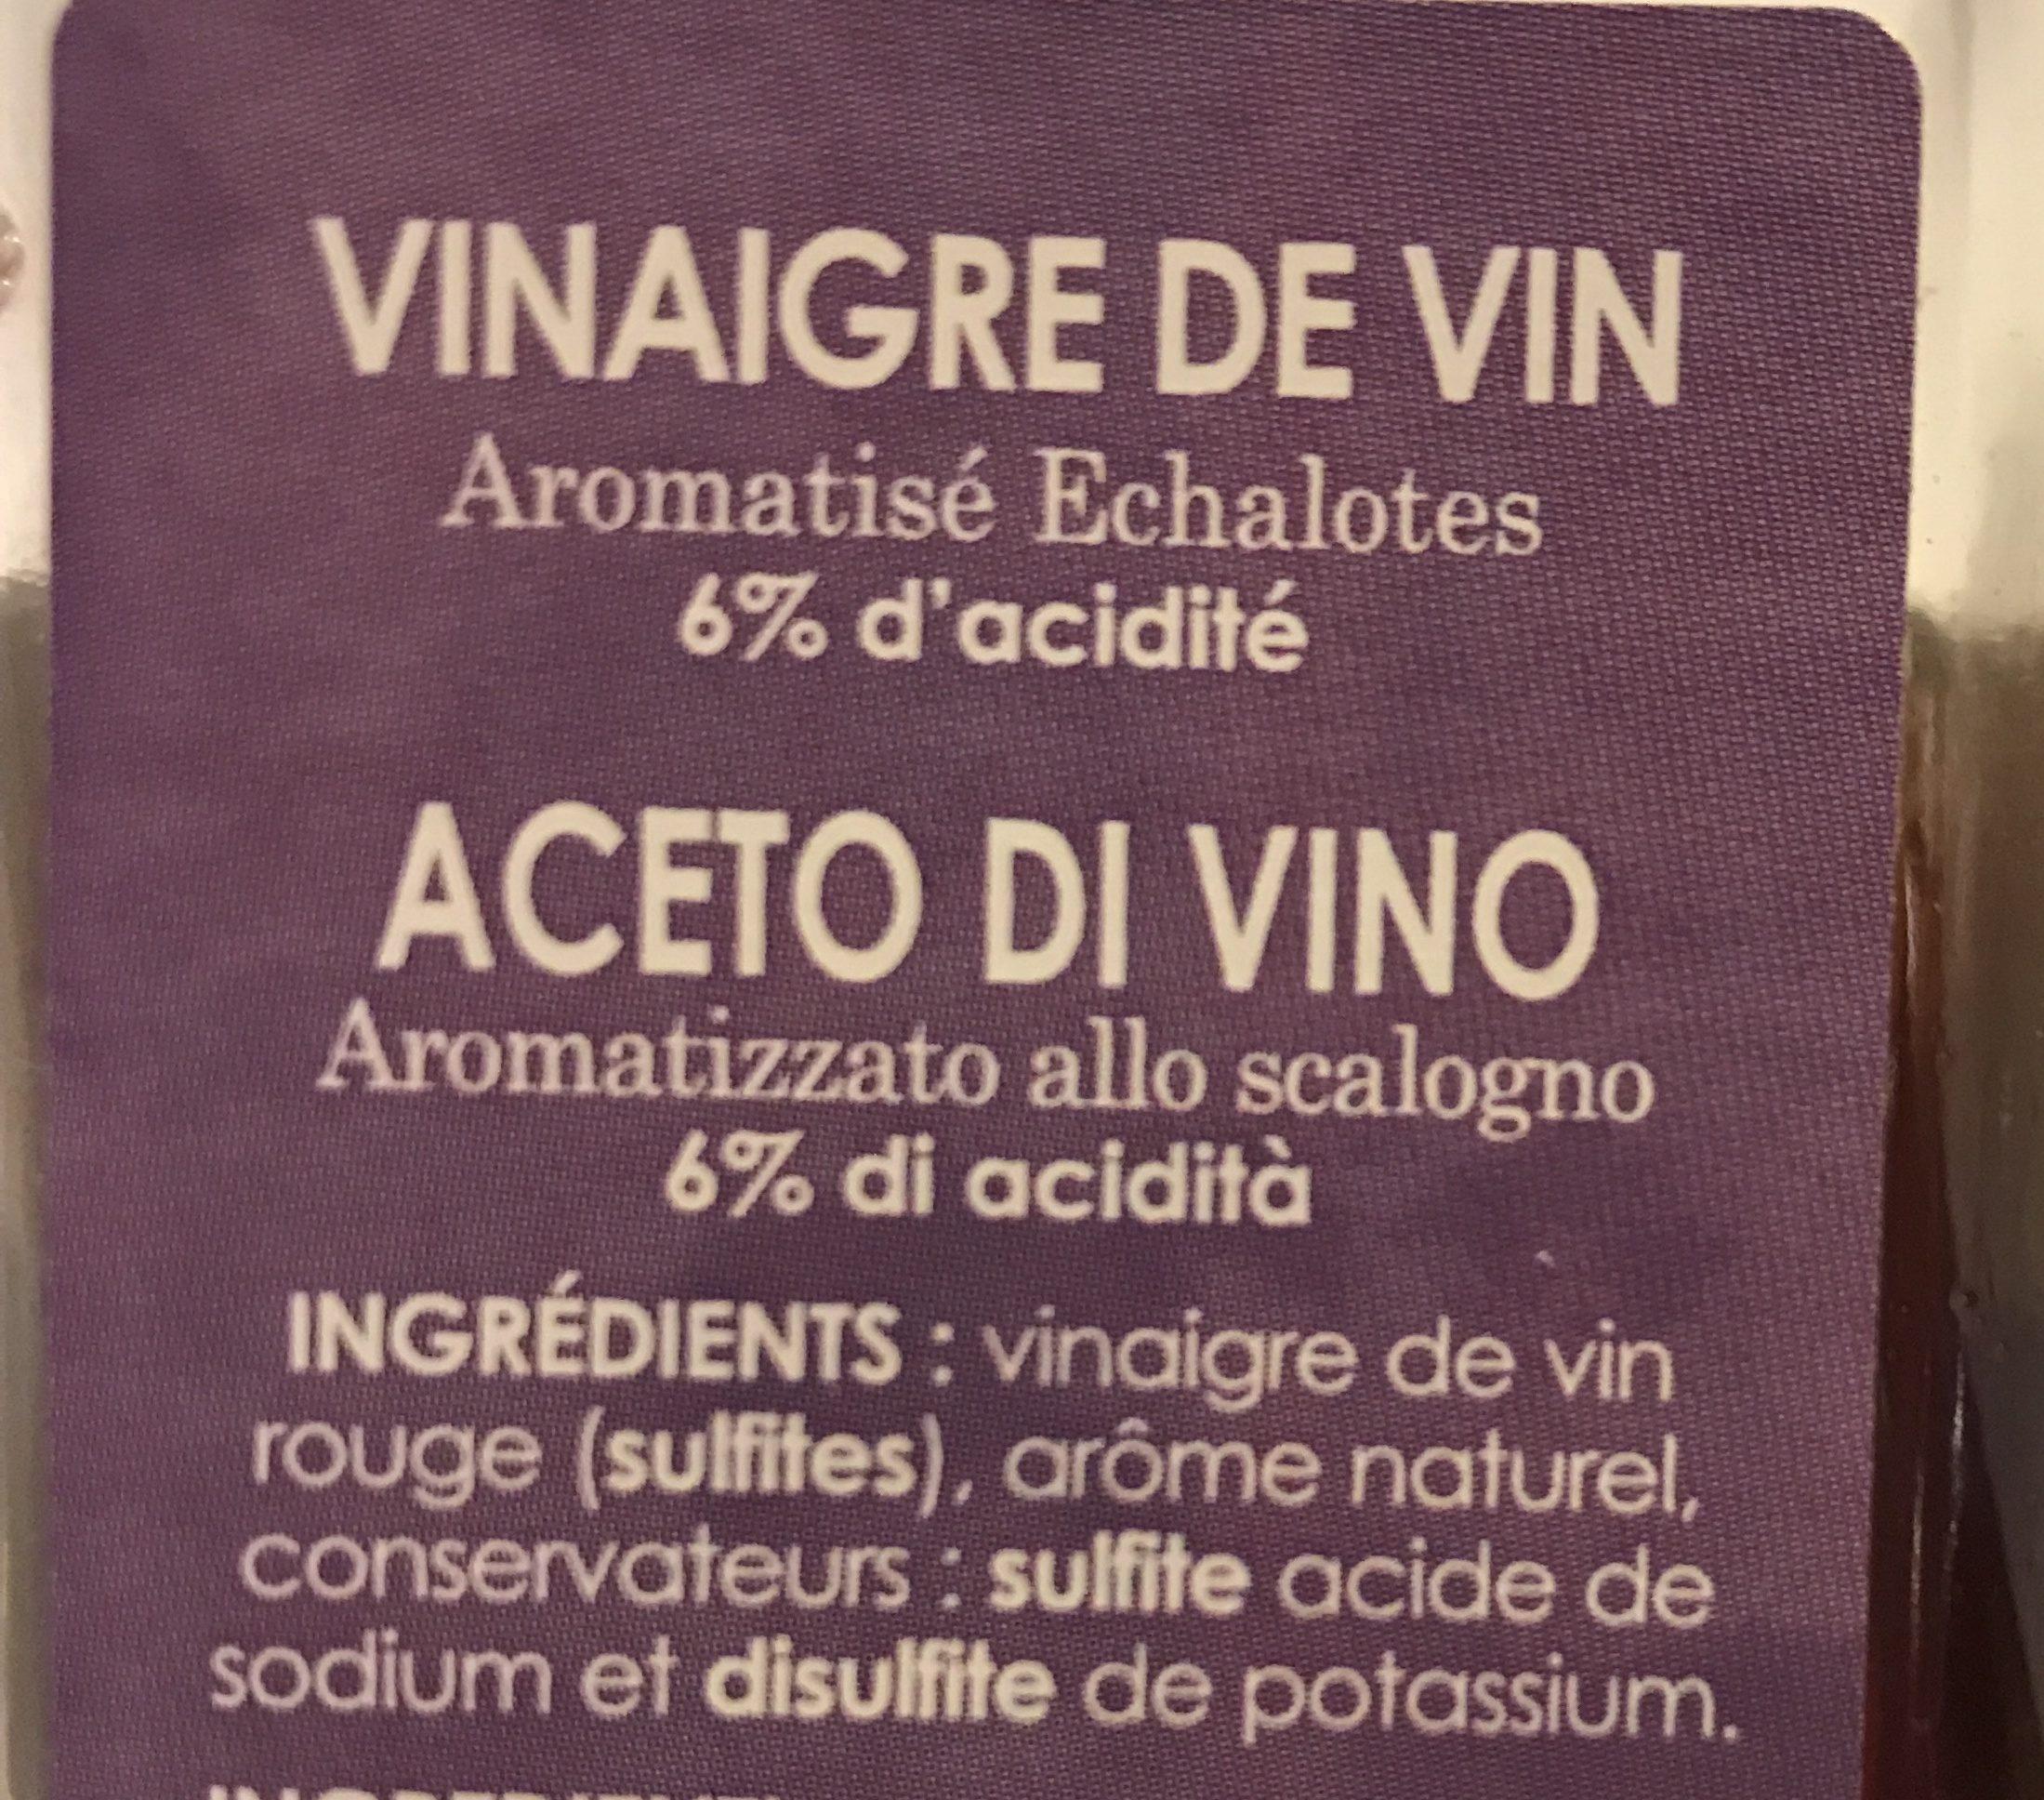 Vinaigre de vin - Ingredients - fr